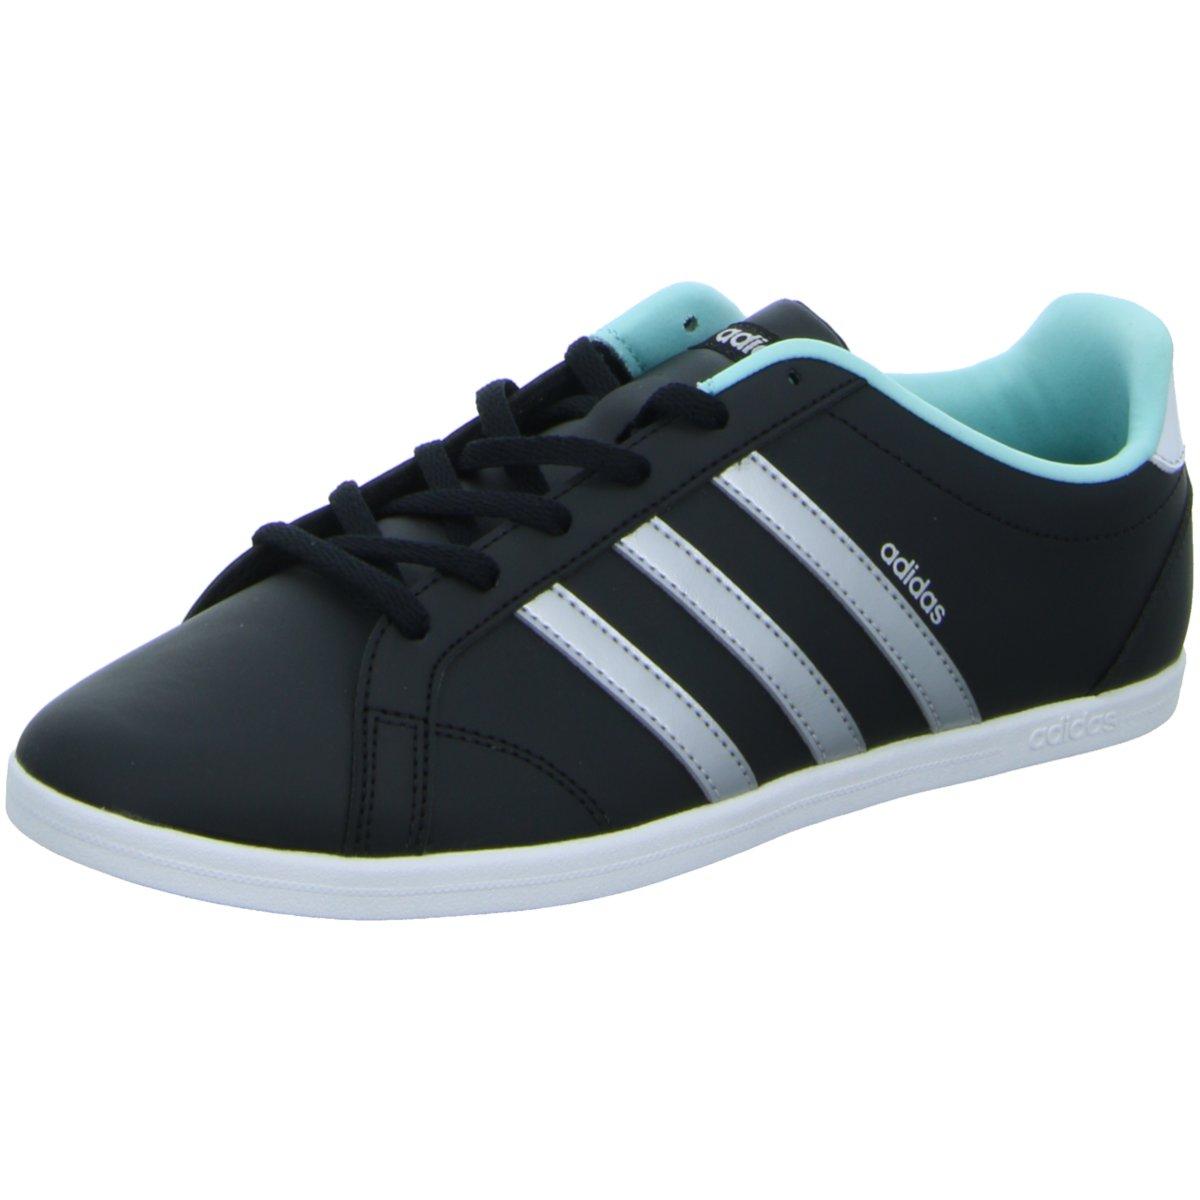 Adidas Damen Schuhe VS Coneo QT DB0126 Sneaker Turnschuhe Schwarz Weiß